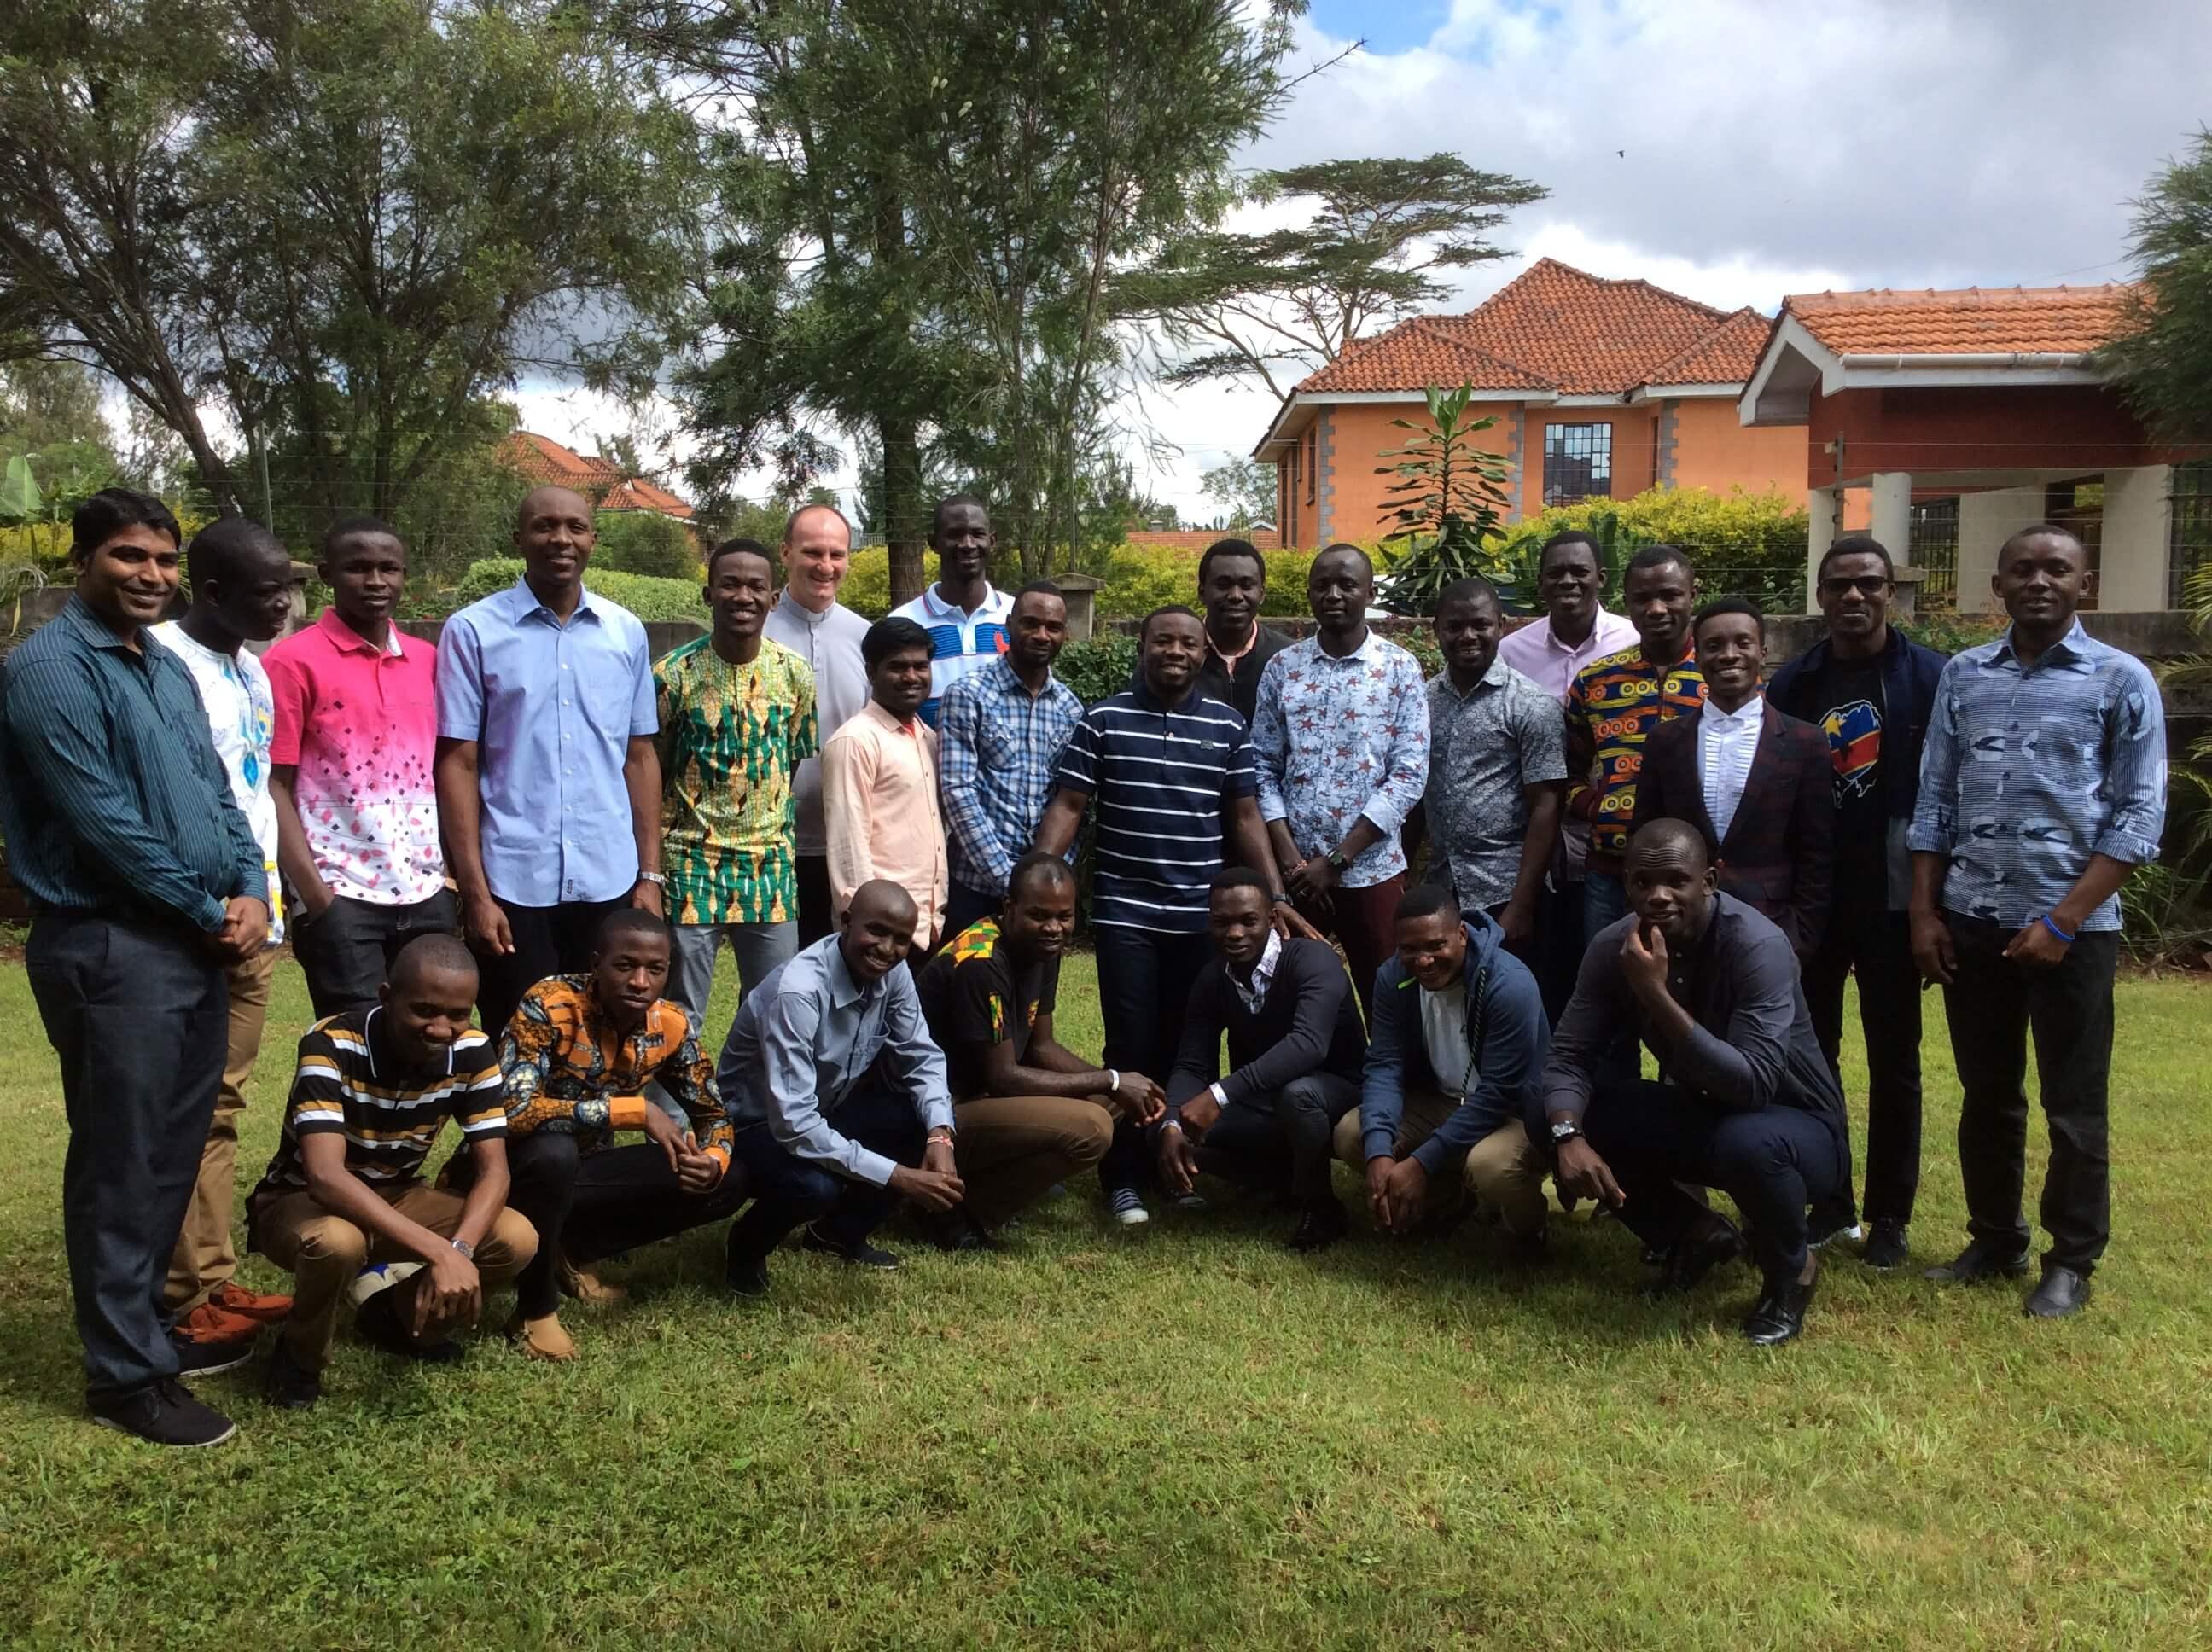 SMA seminarians studying in Nairobi, Kenya - large group photo